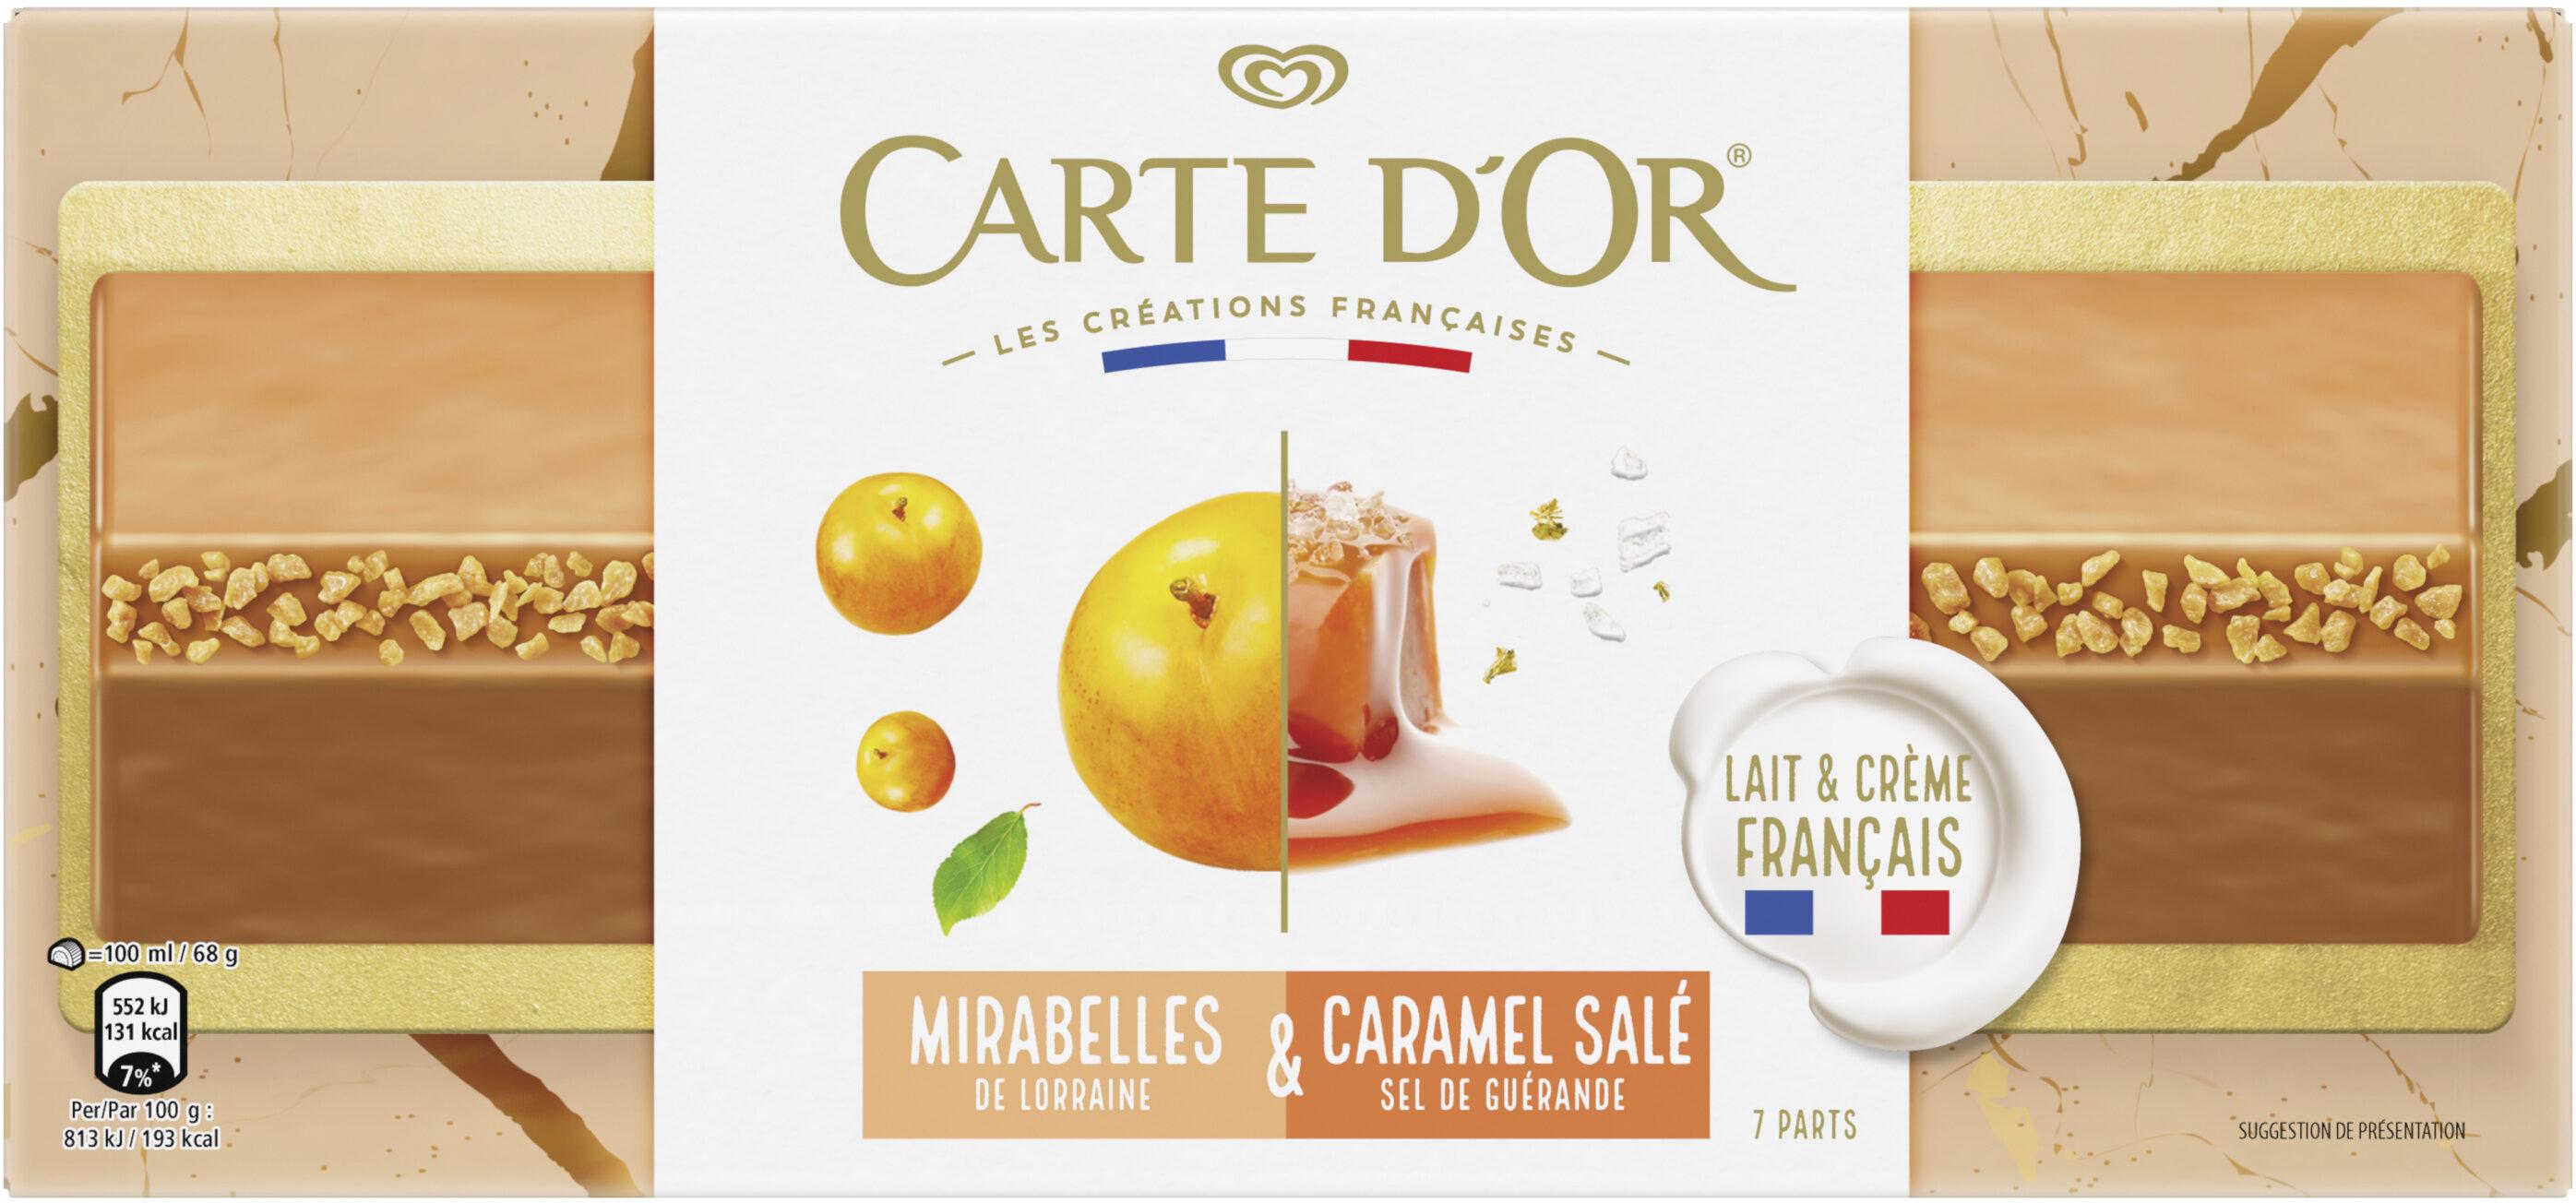 Carte D'or Glace Bûche Mirabelles Caramel 7 parts 700ml - Prodotto - fr